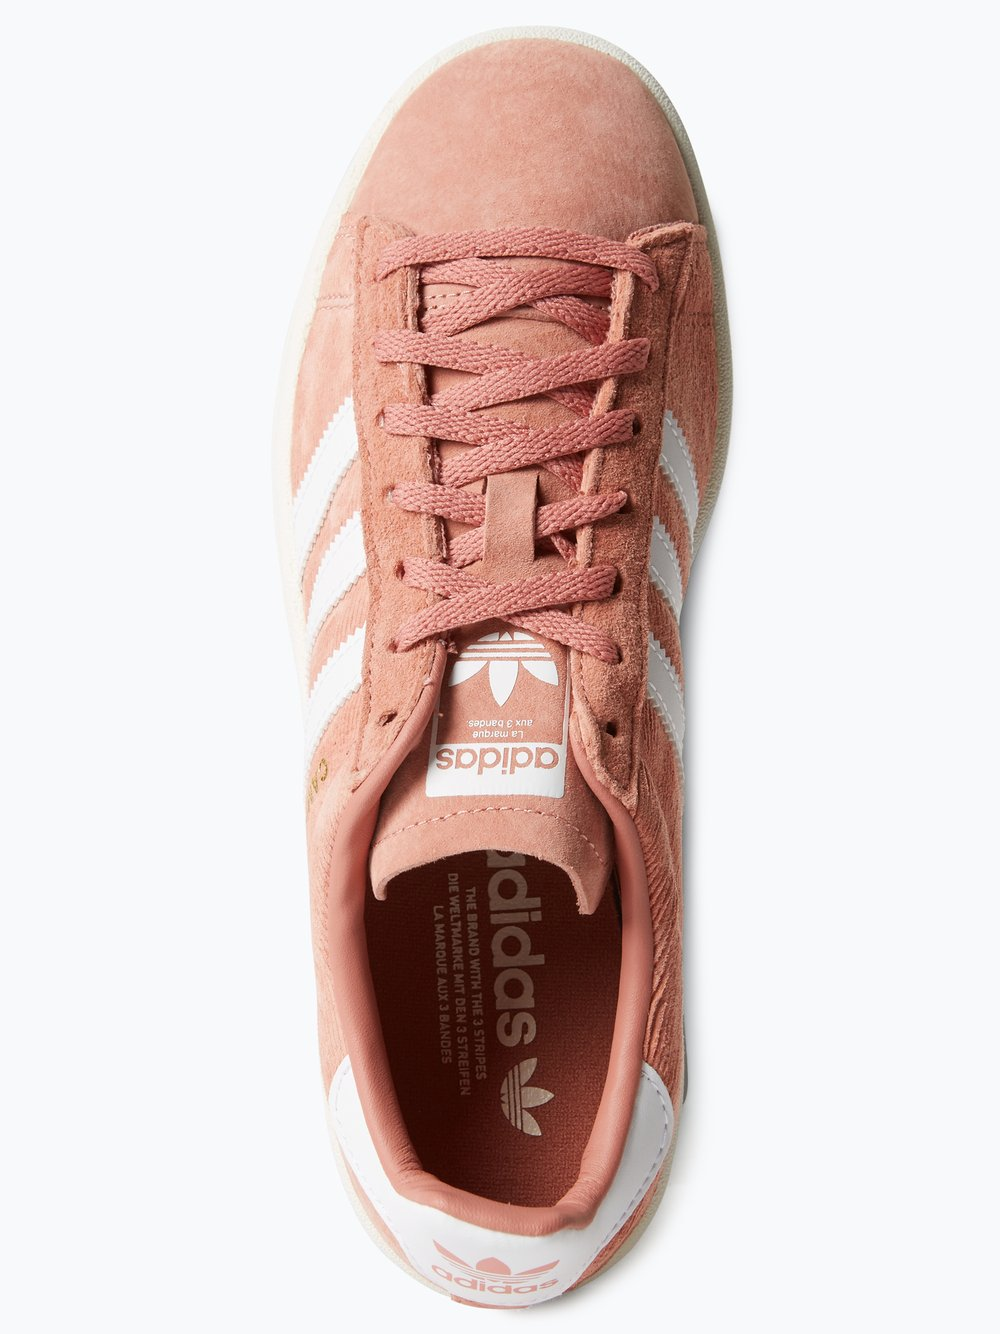 adidas Originals Tenisówki damskie ze skóry welurowej